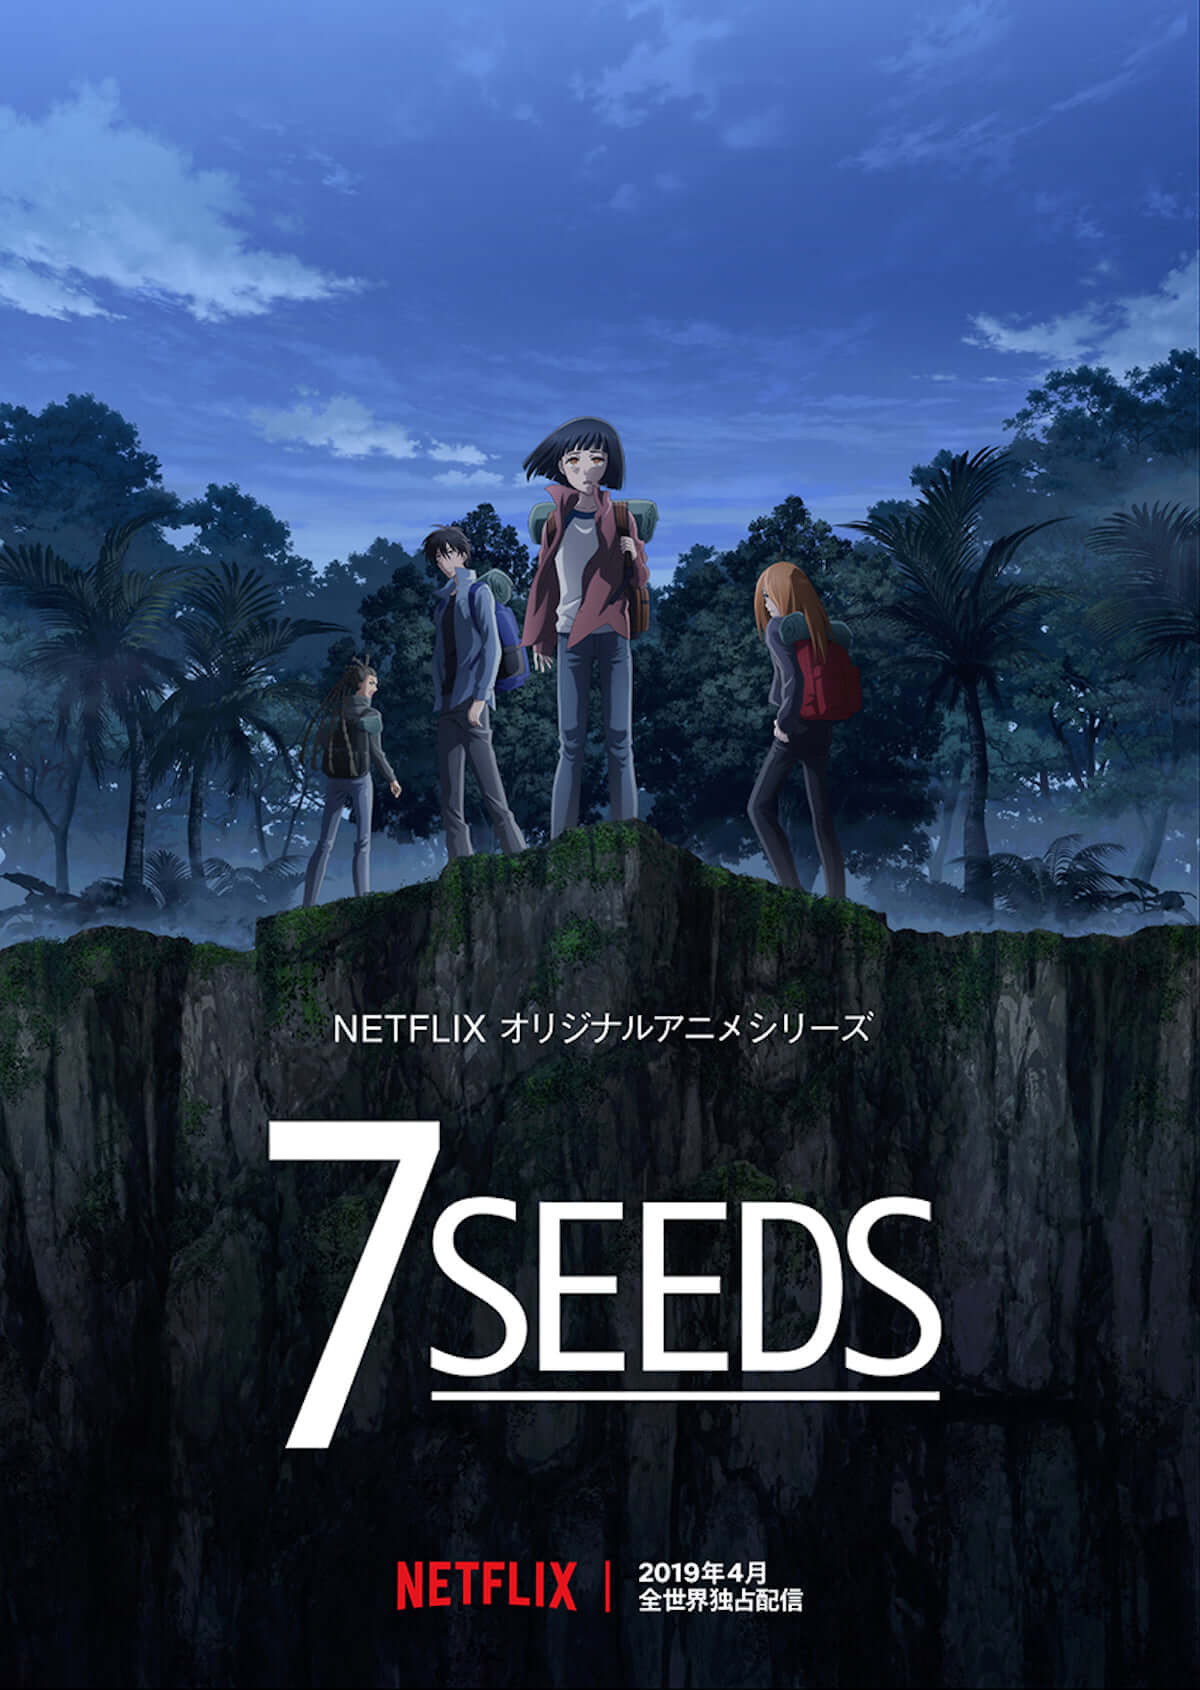 Netflixで新世紀エヴァンゲリオンが2019年春から全世界独占配信! film181127_netflix-anime_1-1200x1690